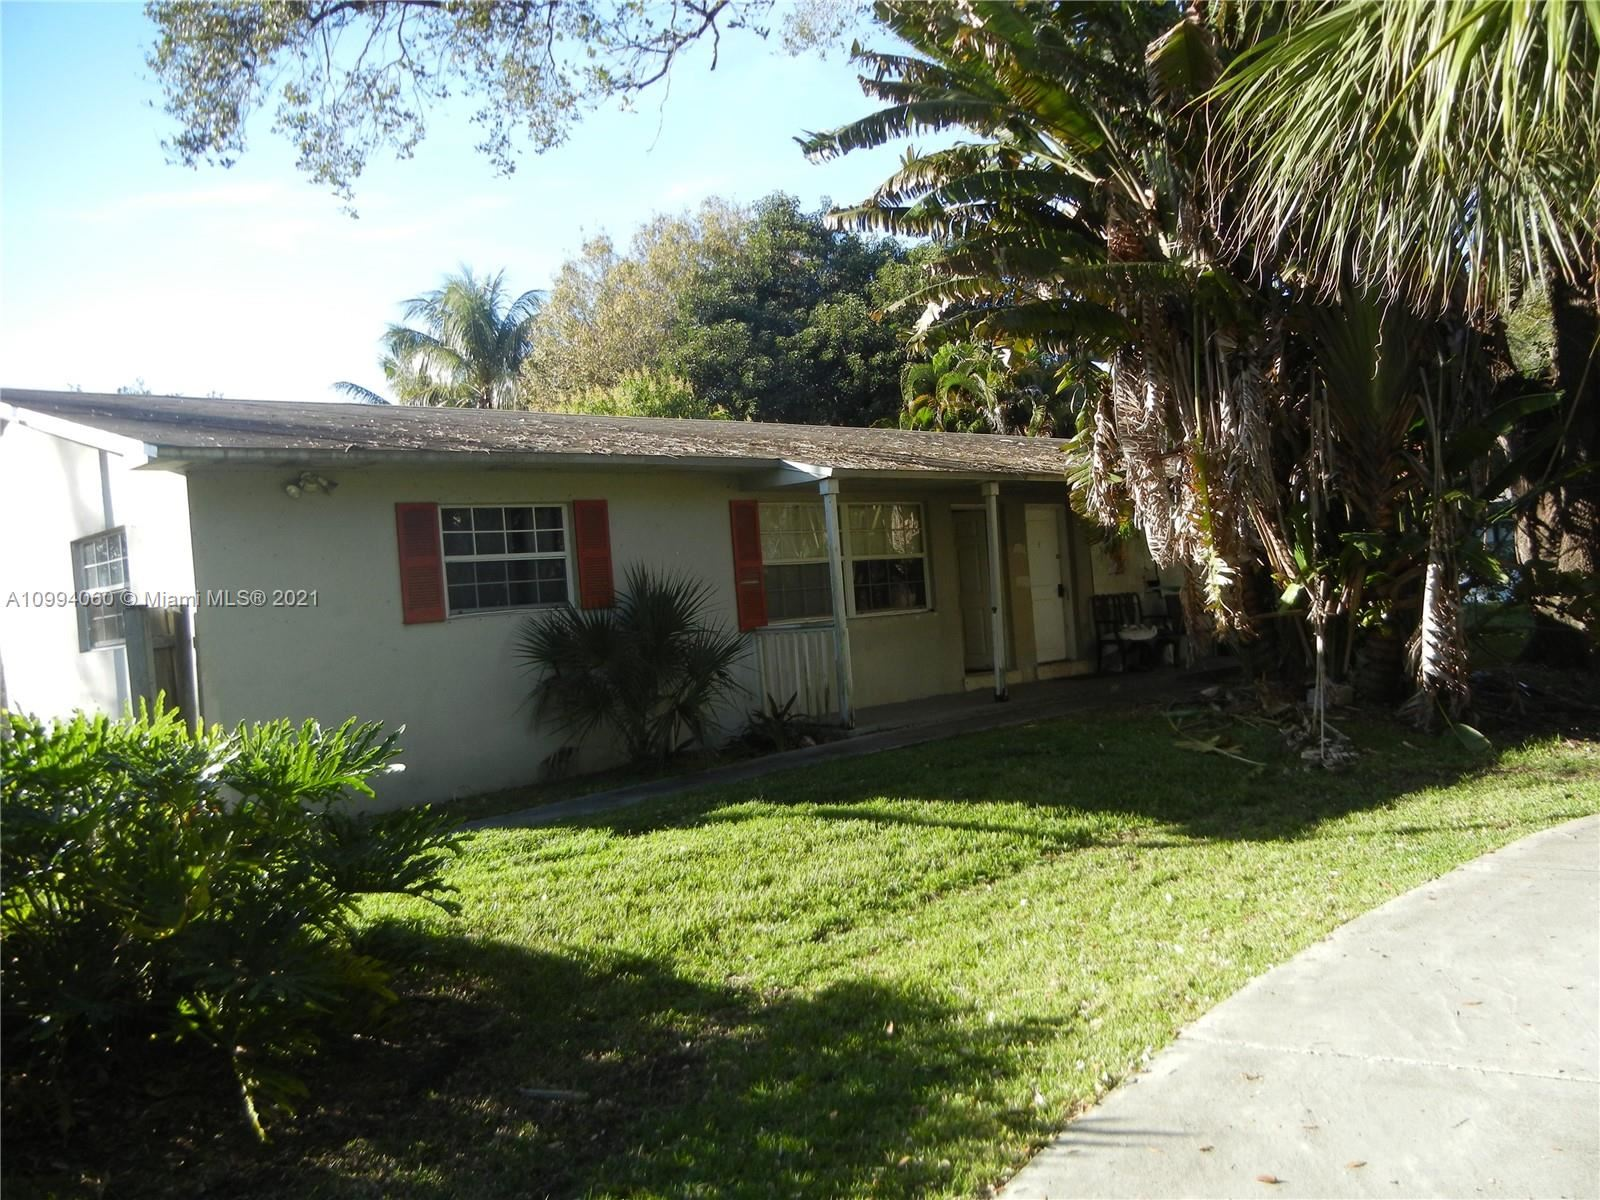 1701 SW 23rd St, Fort Lauderdale, FL 33315 - #: A10994060